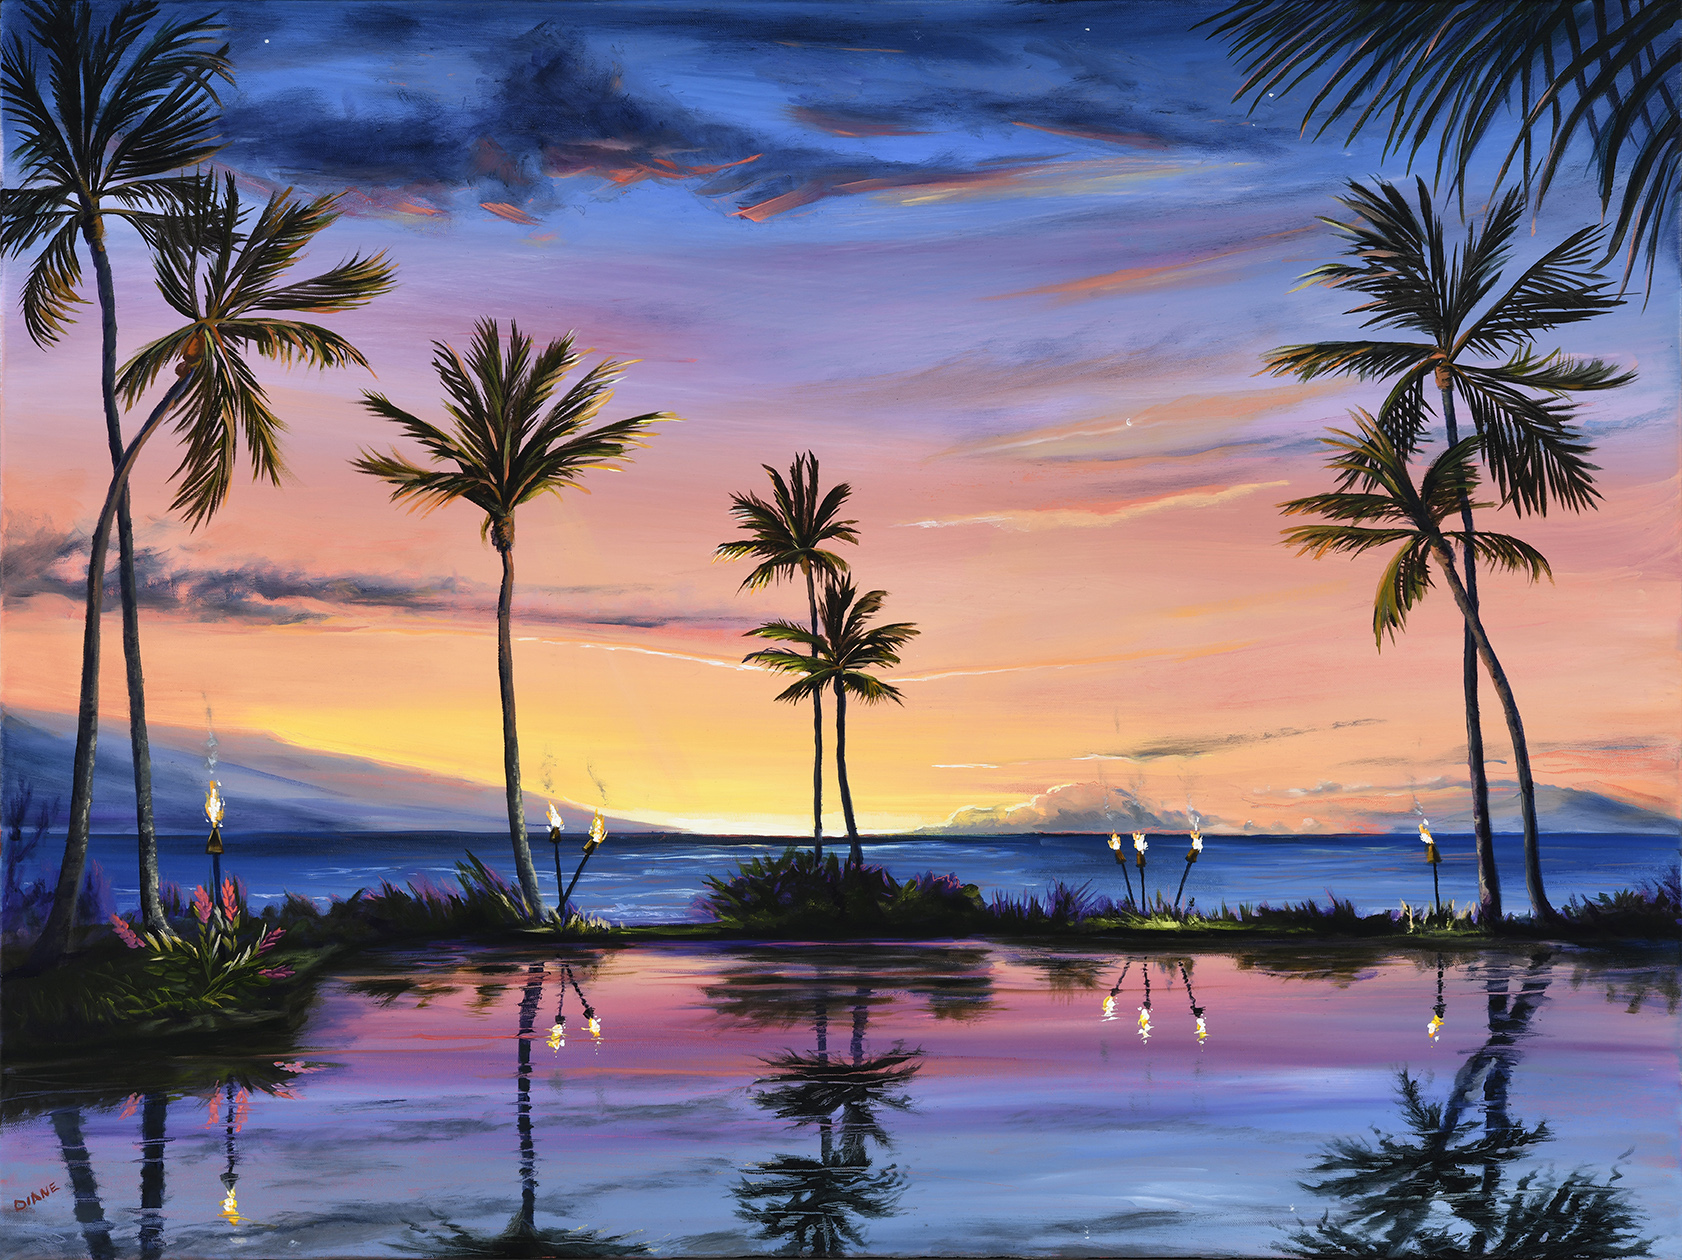 Sunset Across the Grand 30 x 40